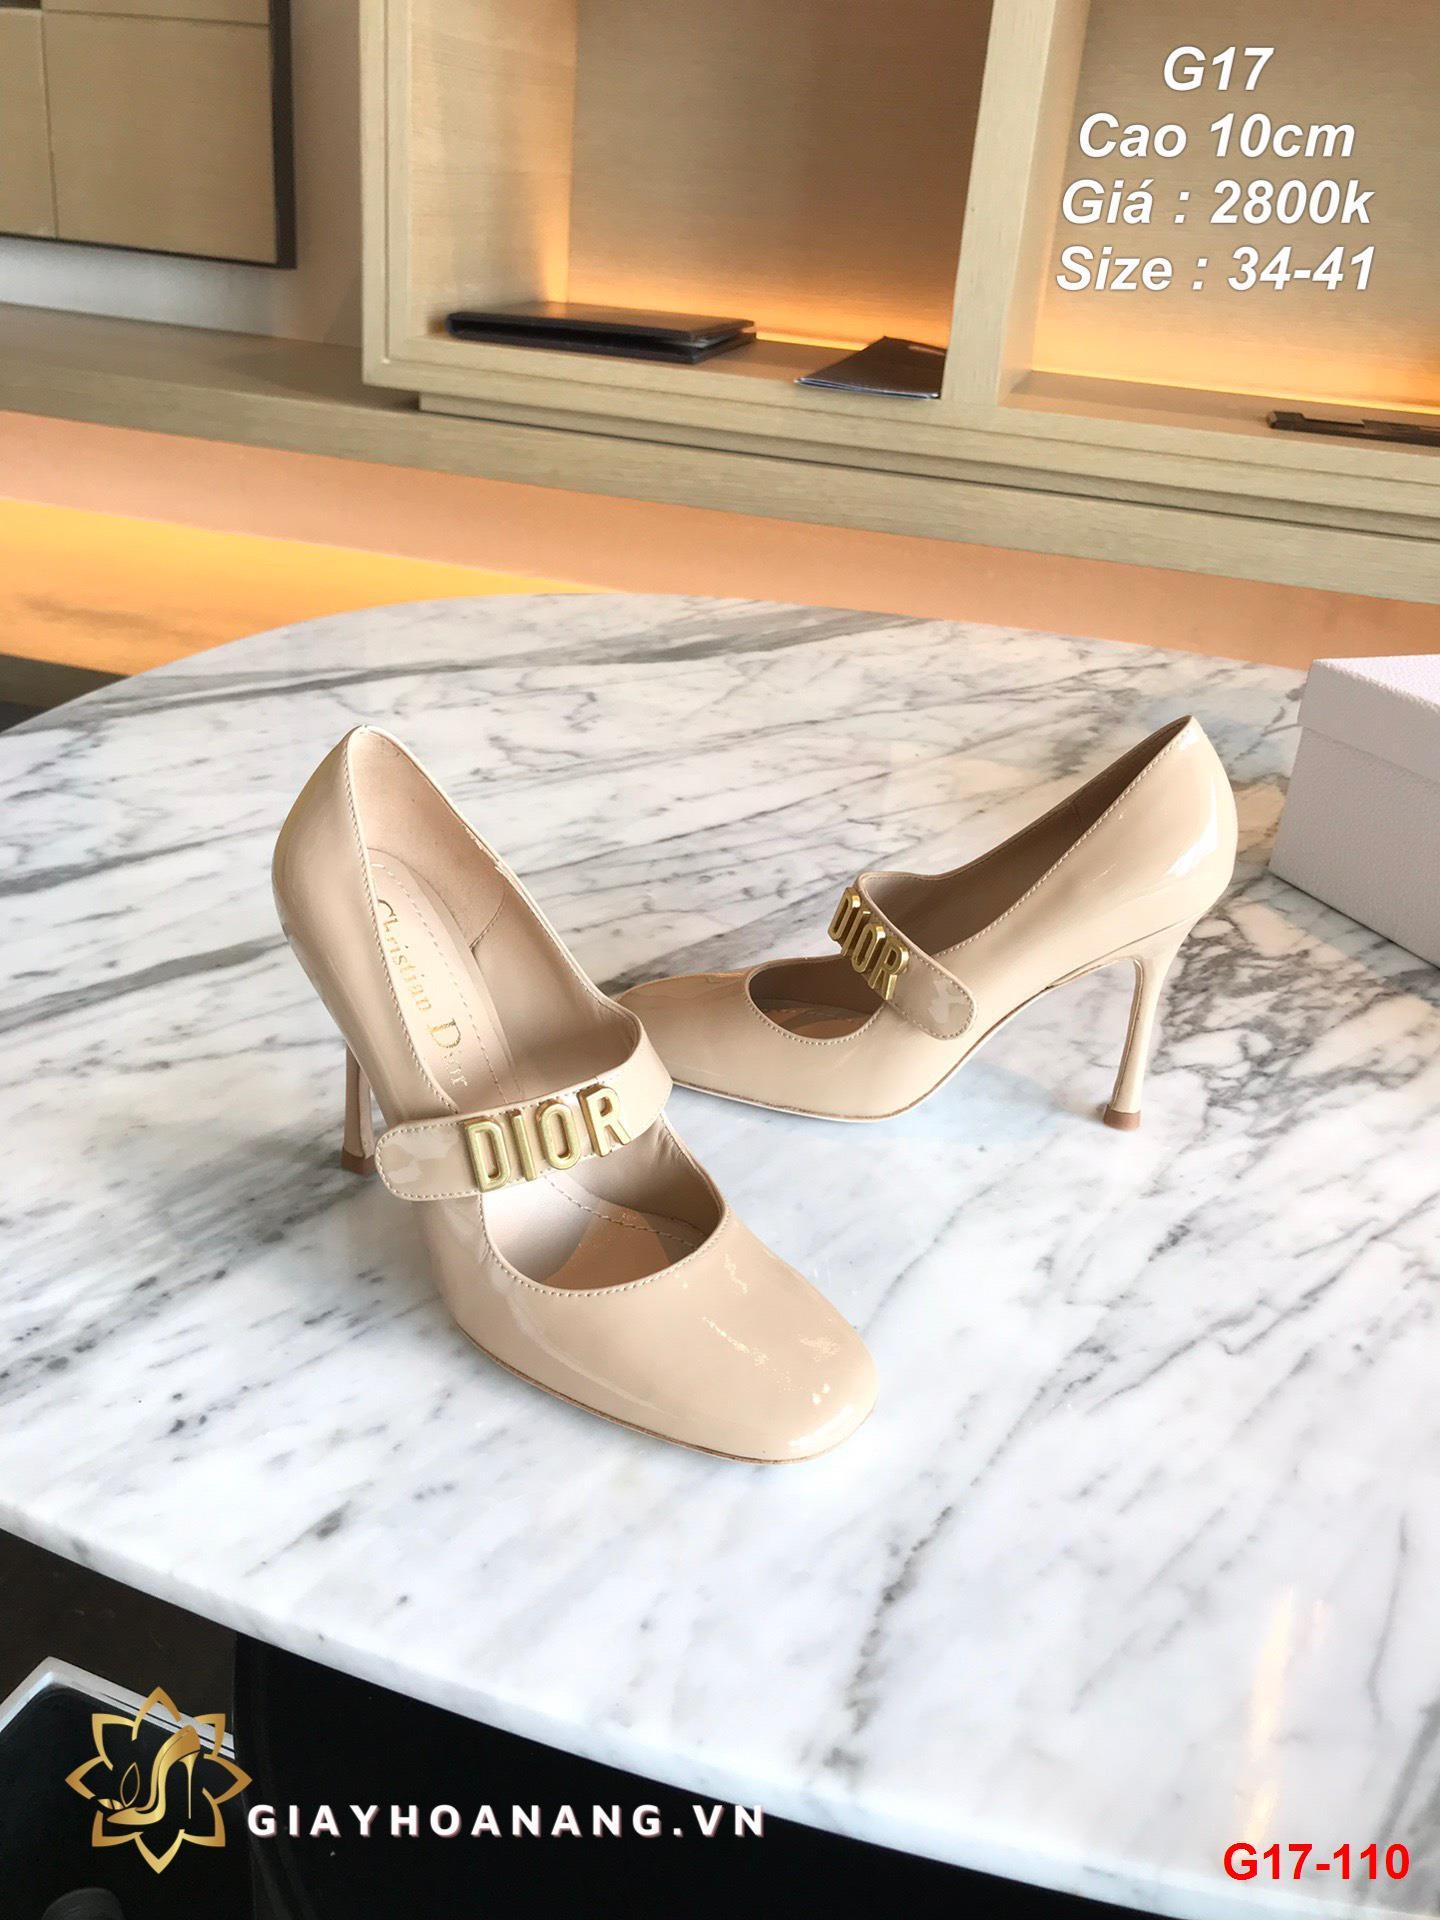 G17-110 Dior giày cao 10cm siêu cấp